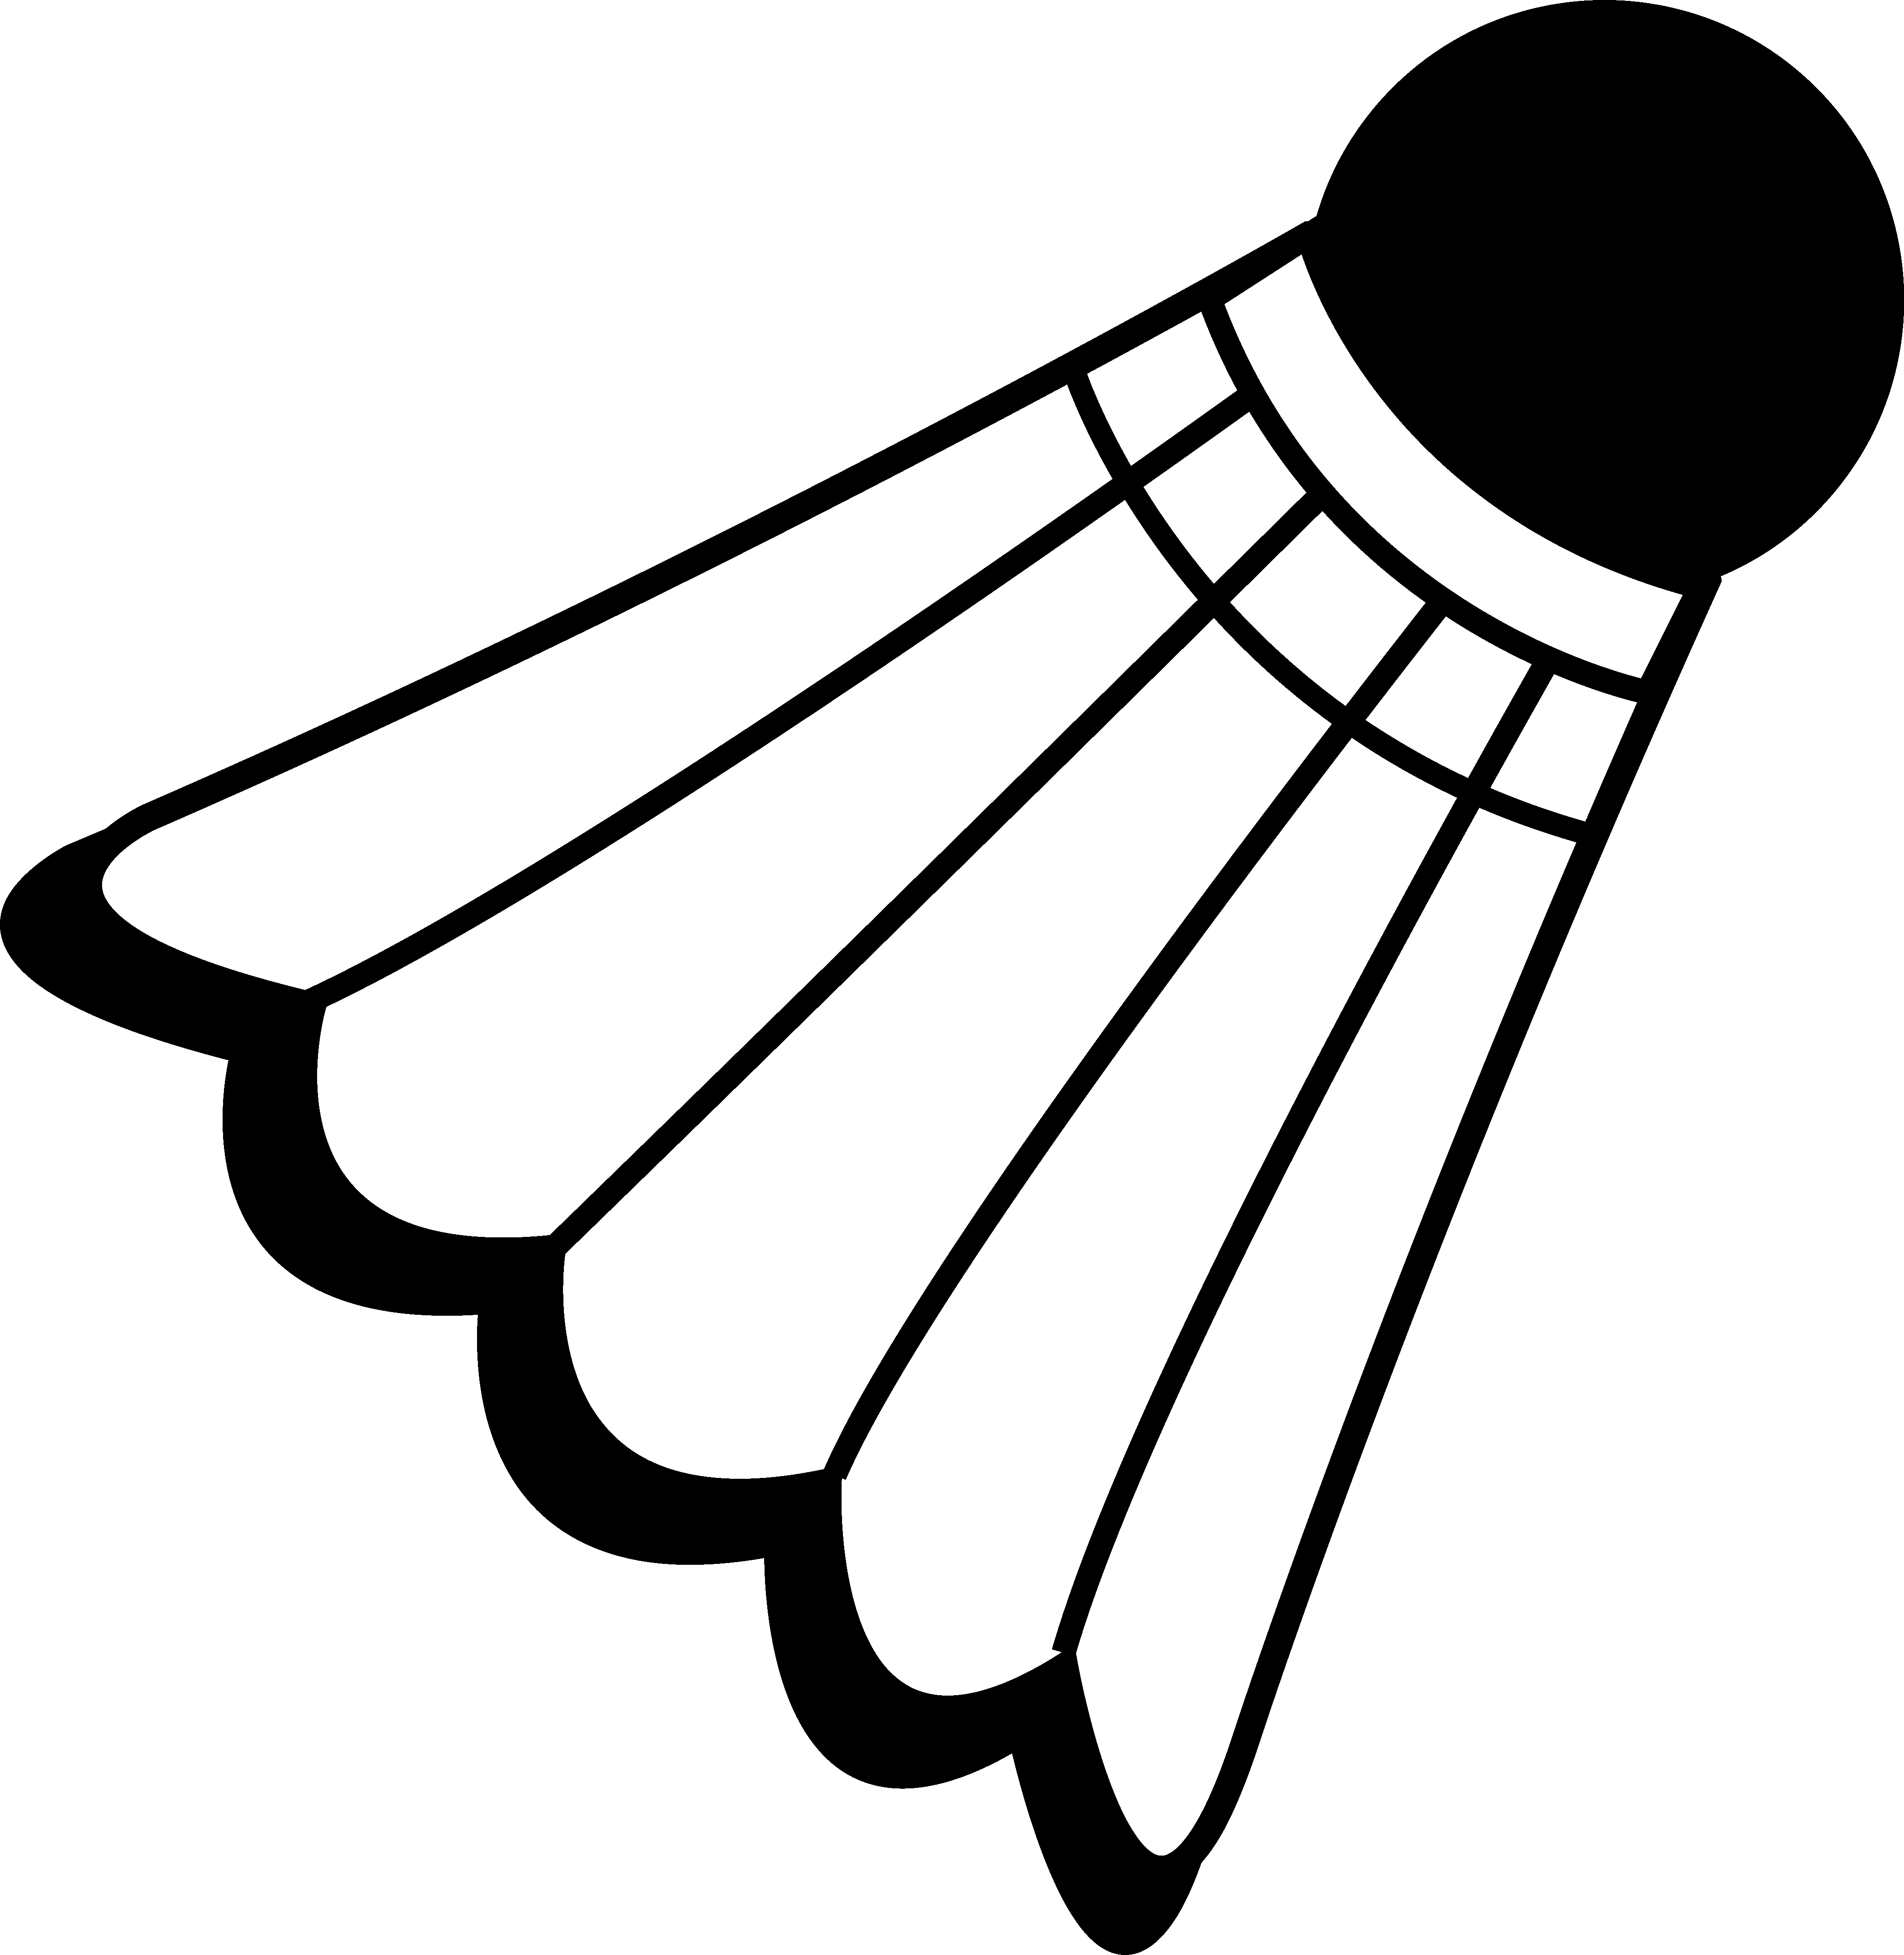 Badminton Clip Art - Cliparts.co Badminton Player Png